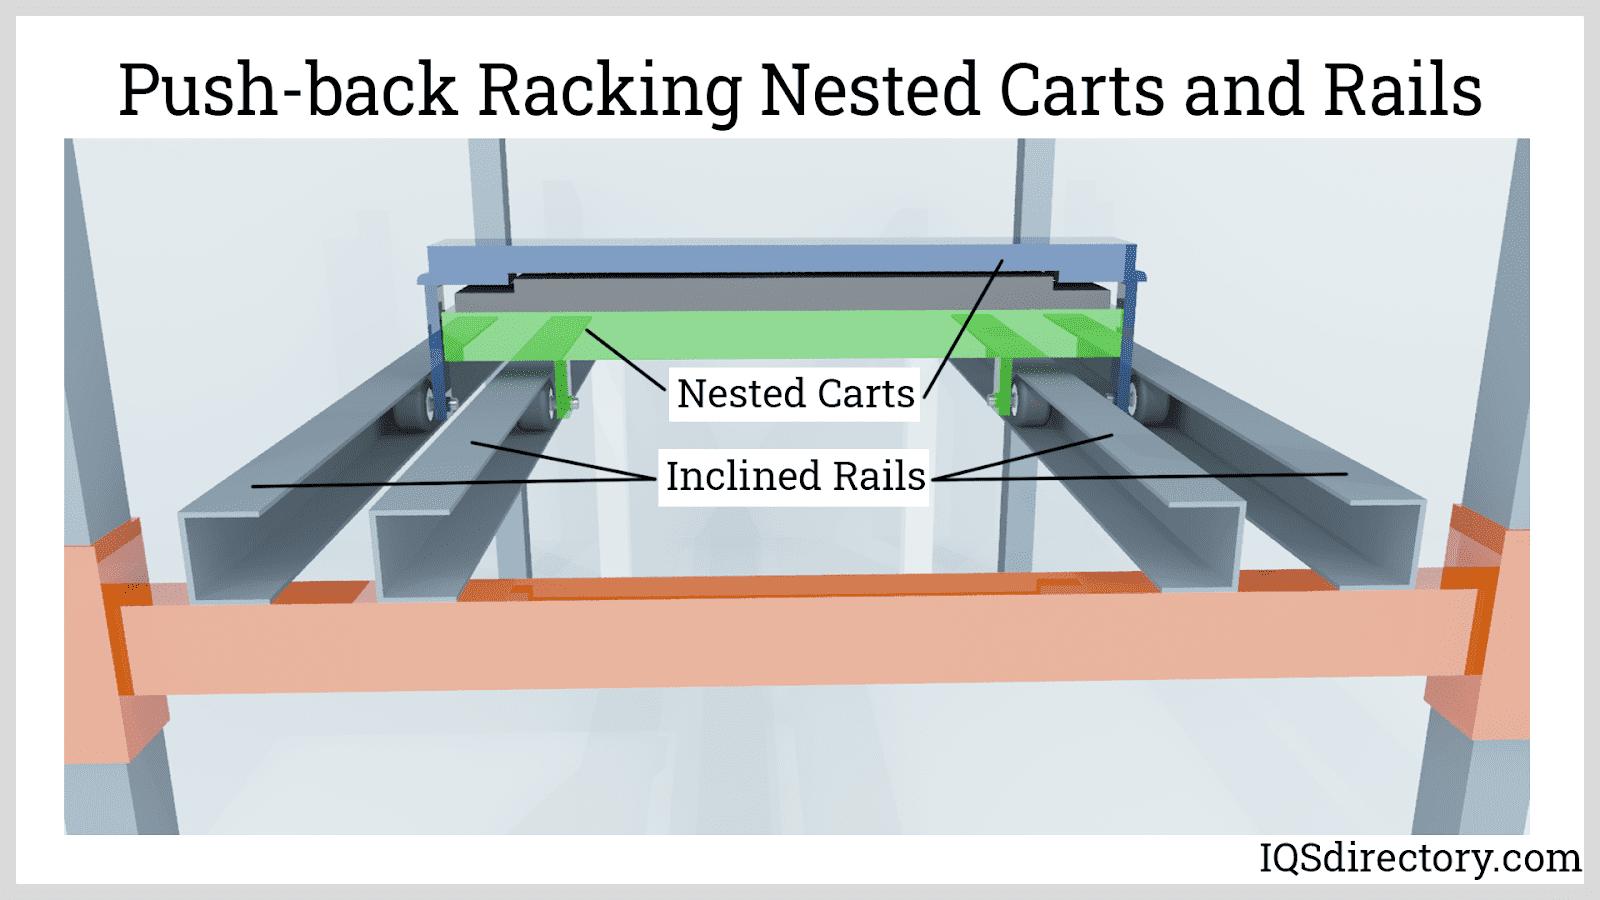 Push-back Racking Nested Carts and Rails